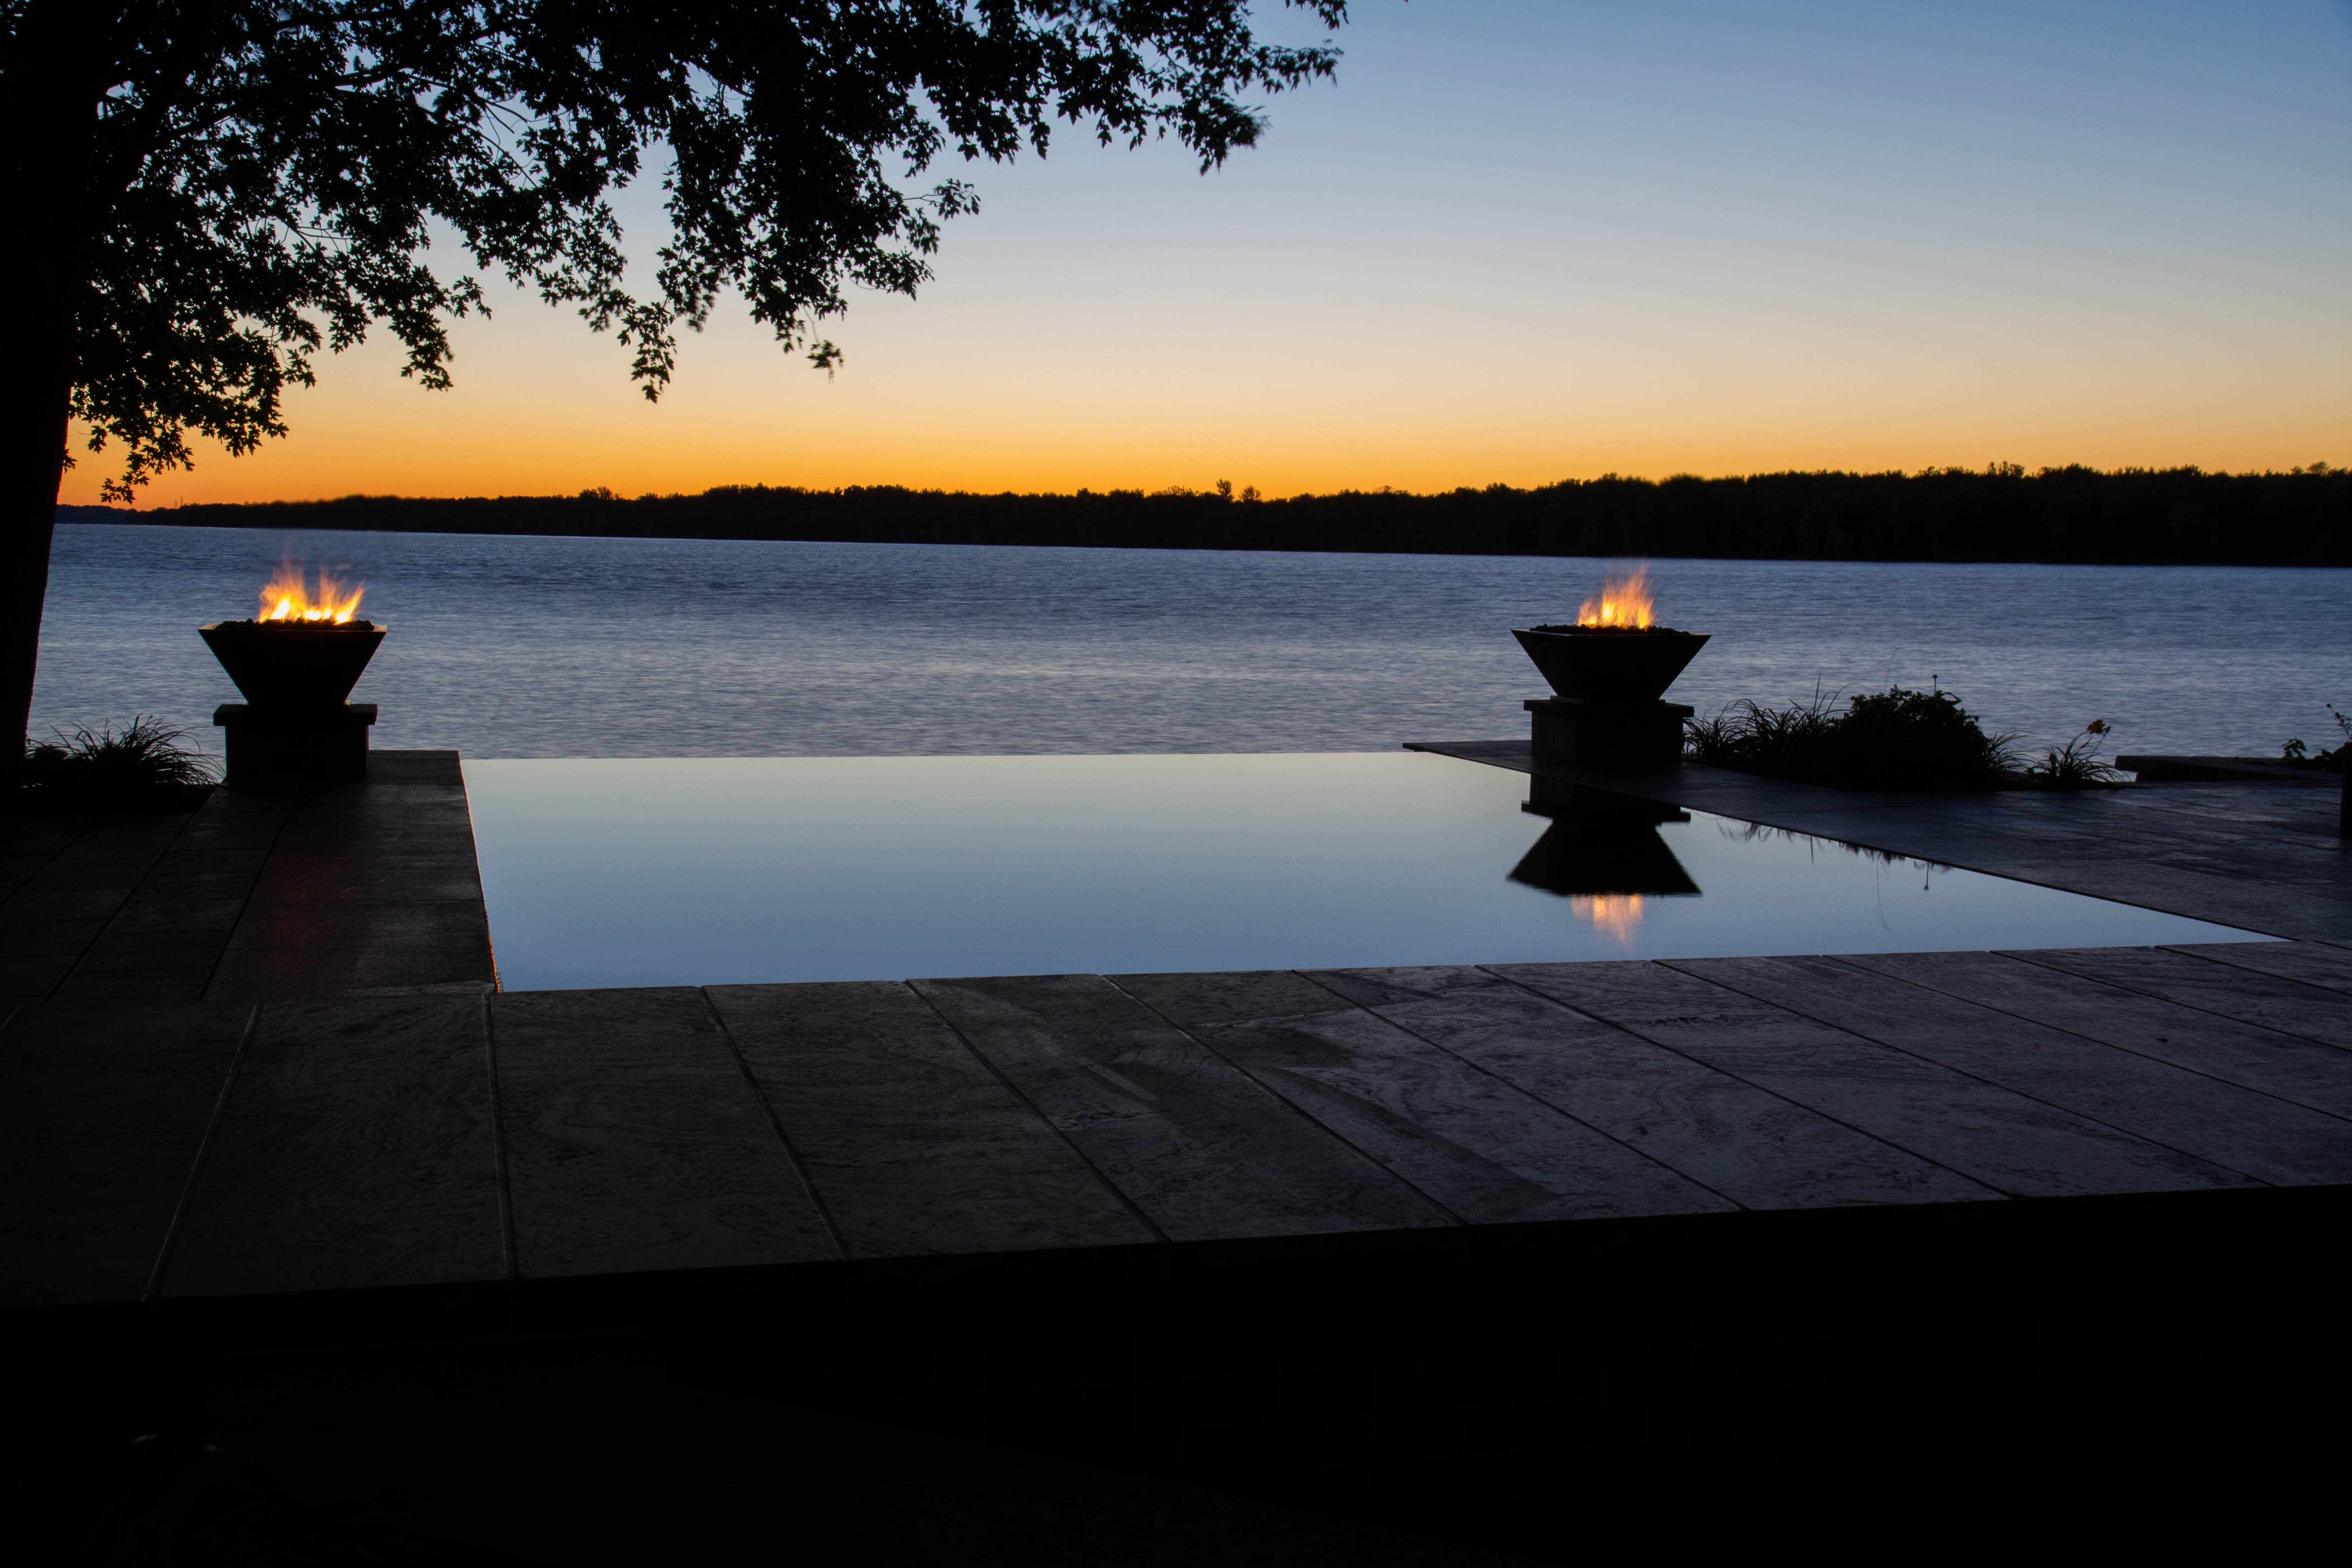 Night Landscape / Infinity Pool